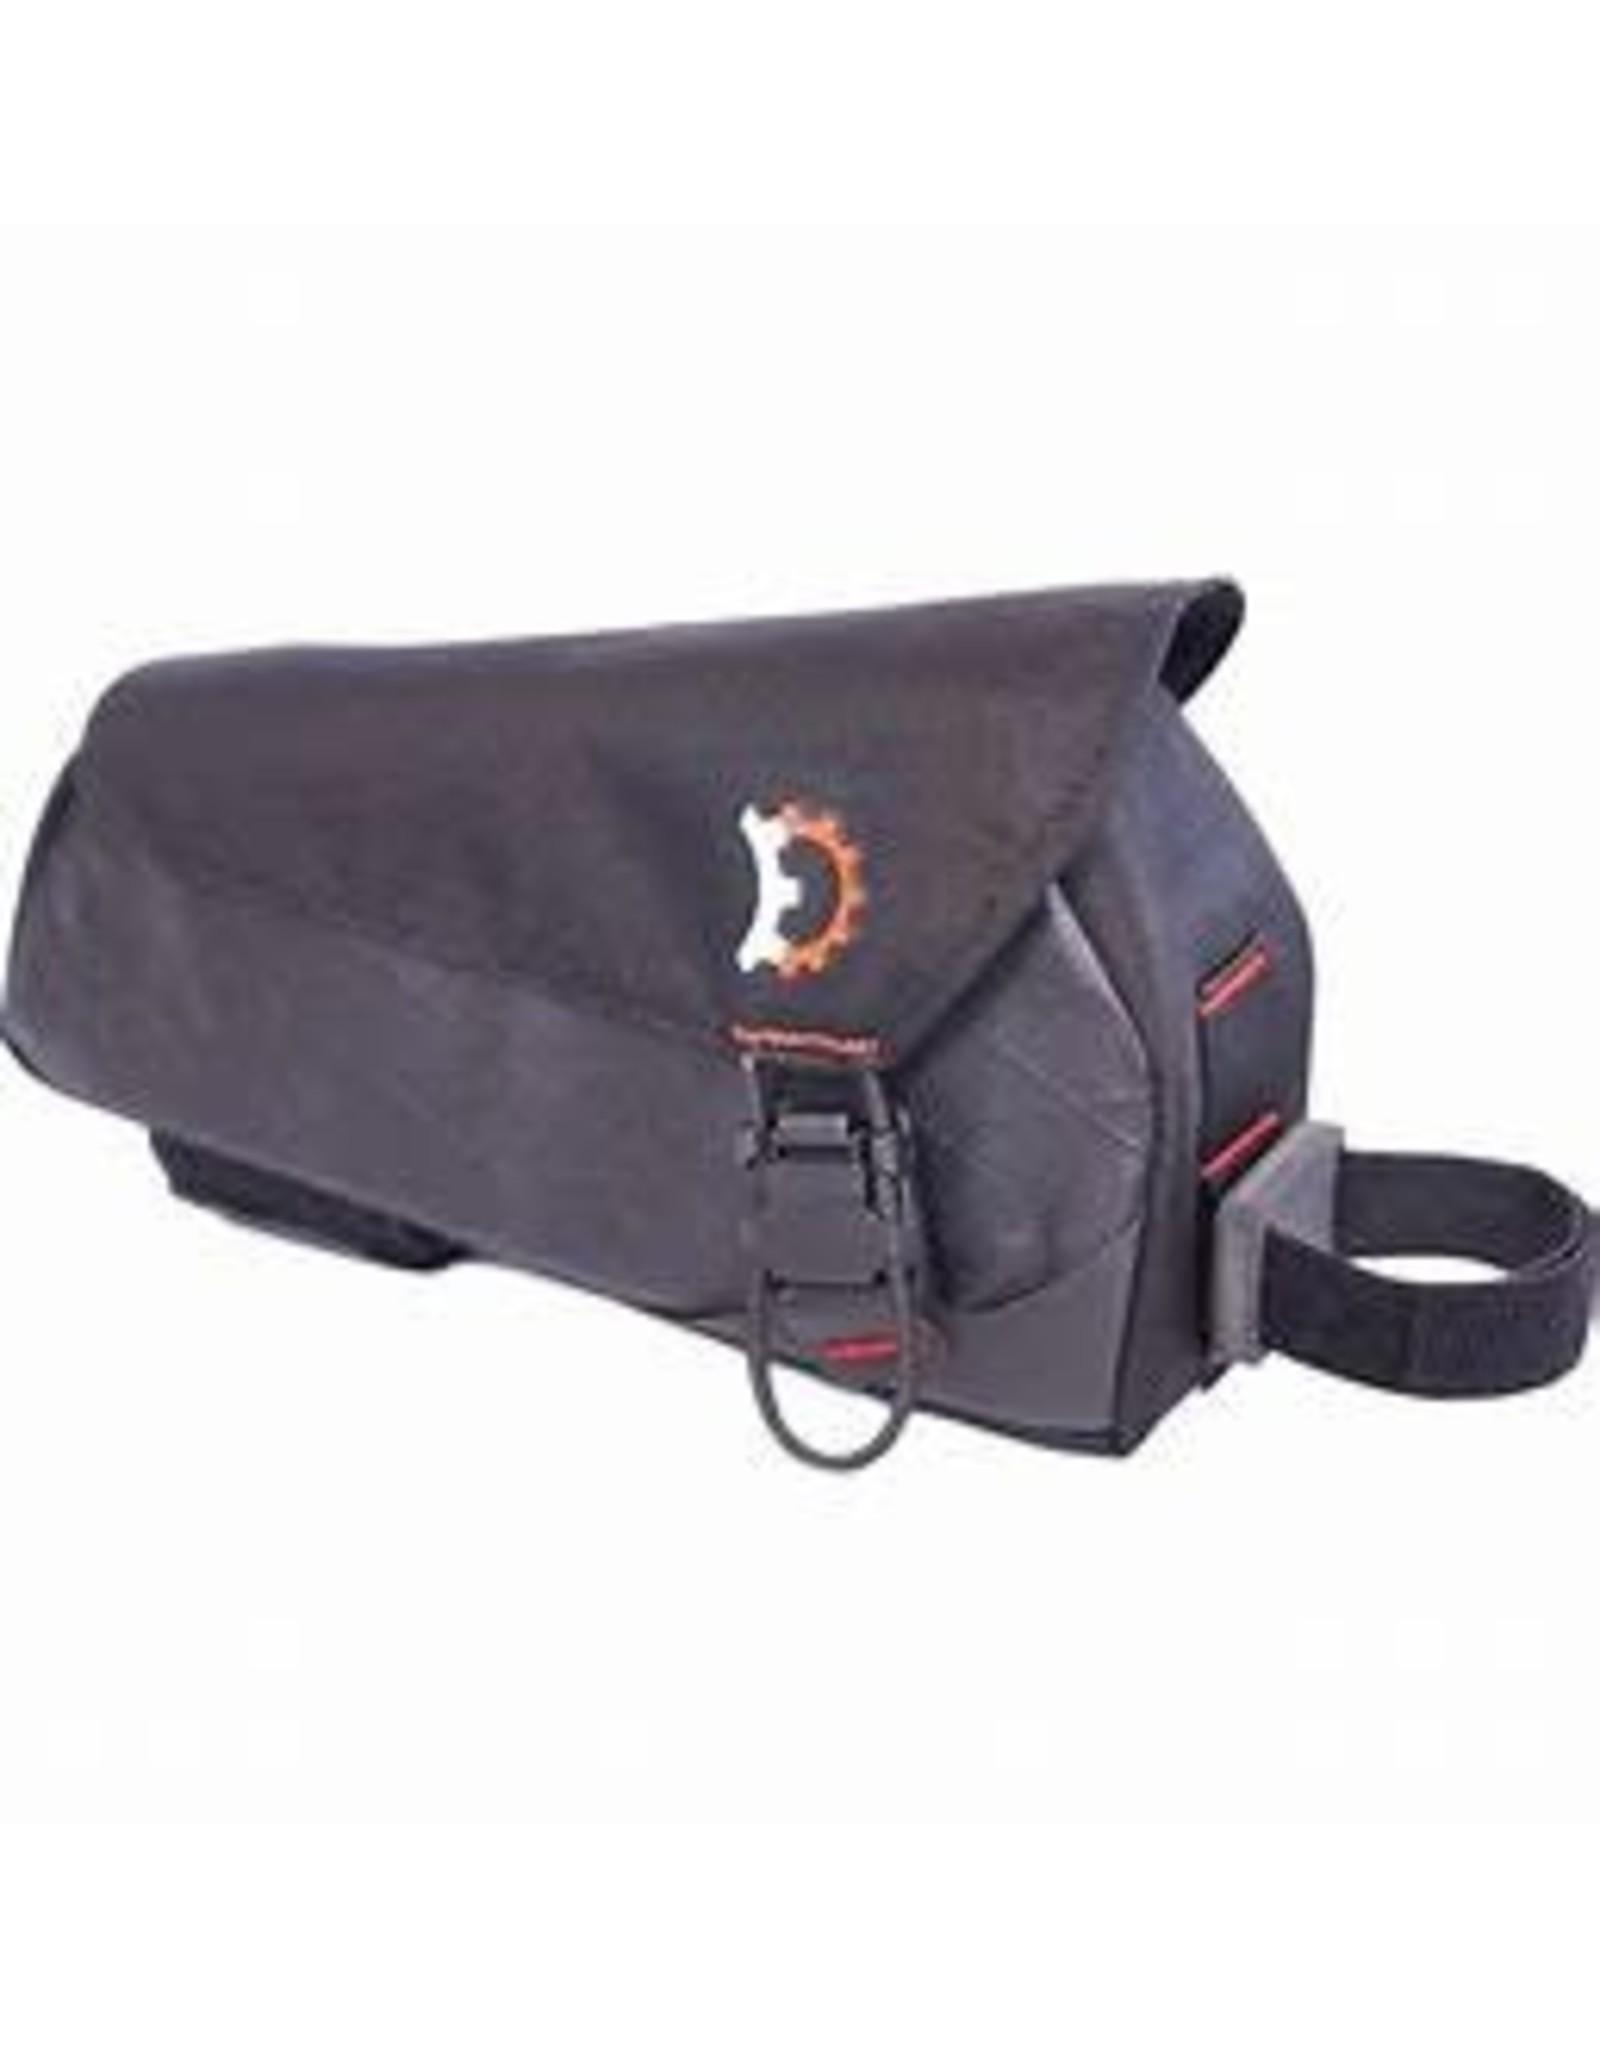 Revelate Designs Mag-Tank Top Tube/Stem Bag, Black